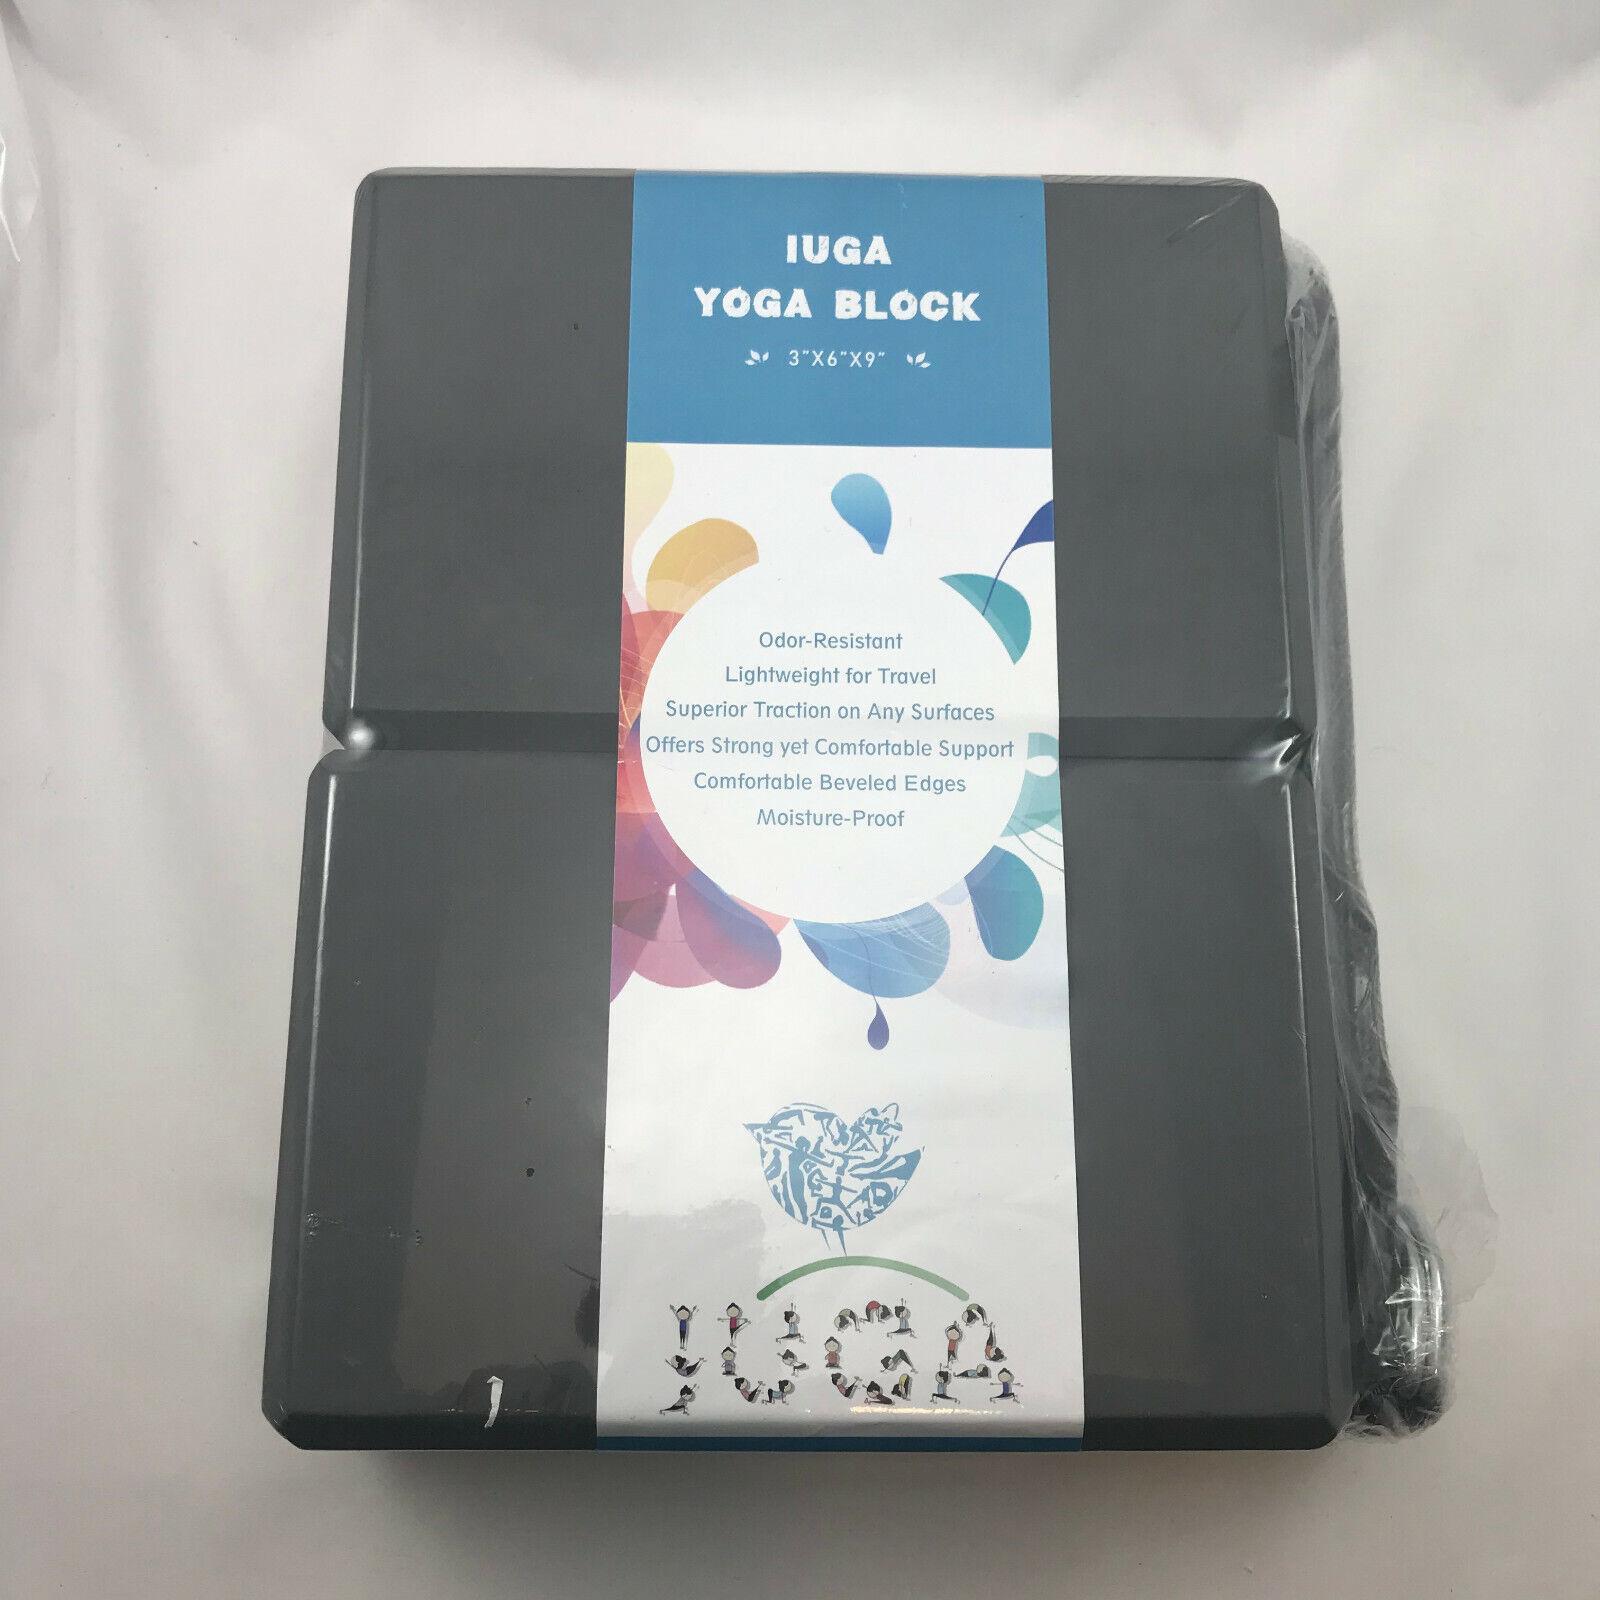 2PC Iuga Yoga Block 3″ x 6″ x 9″ with Metal D Ring Yoga Strap Gray New R34A